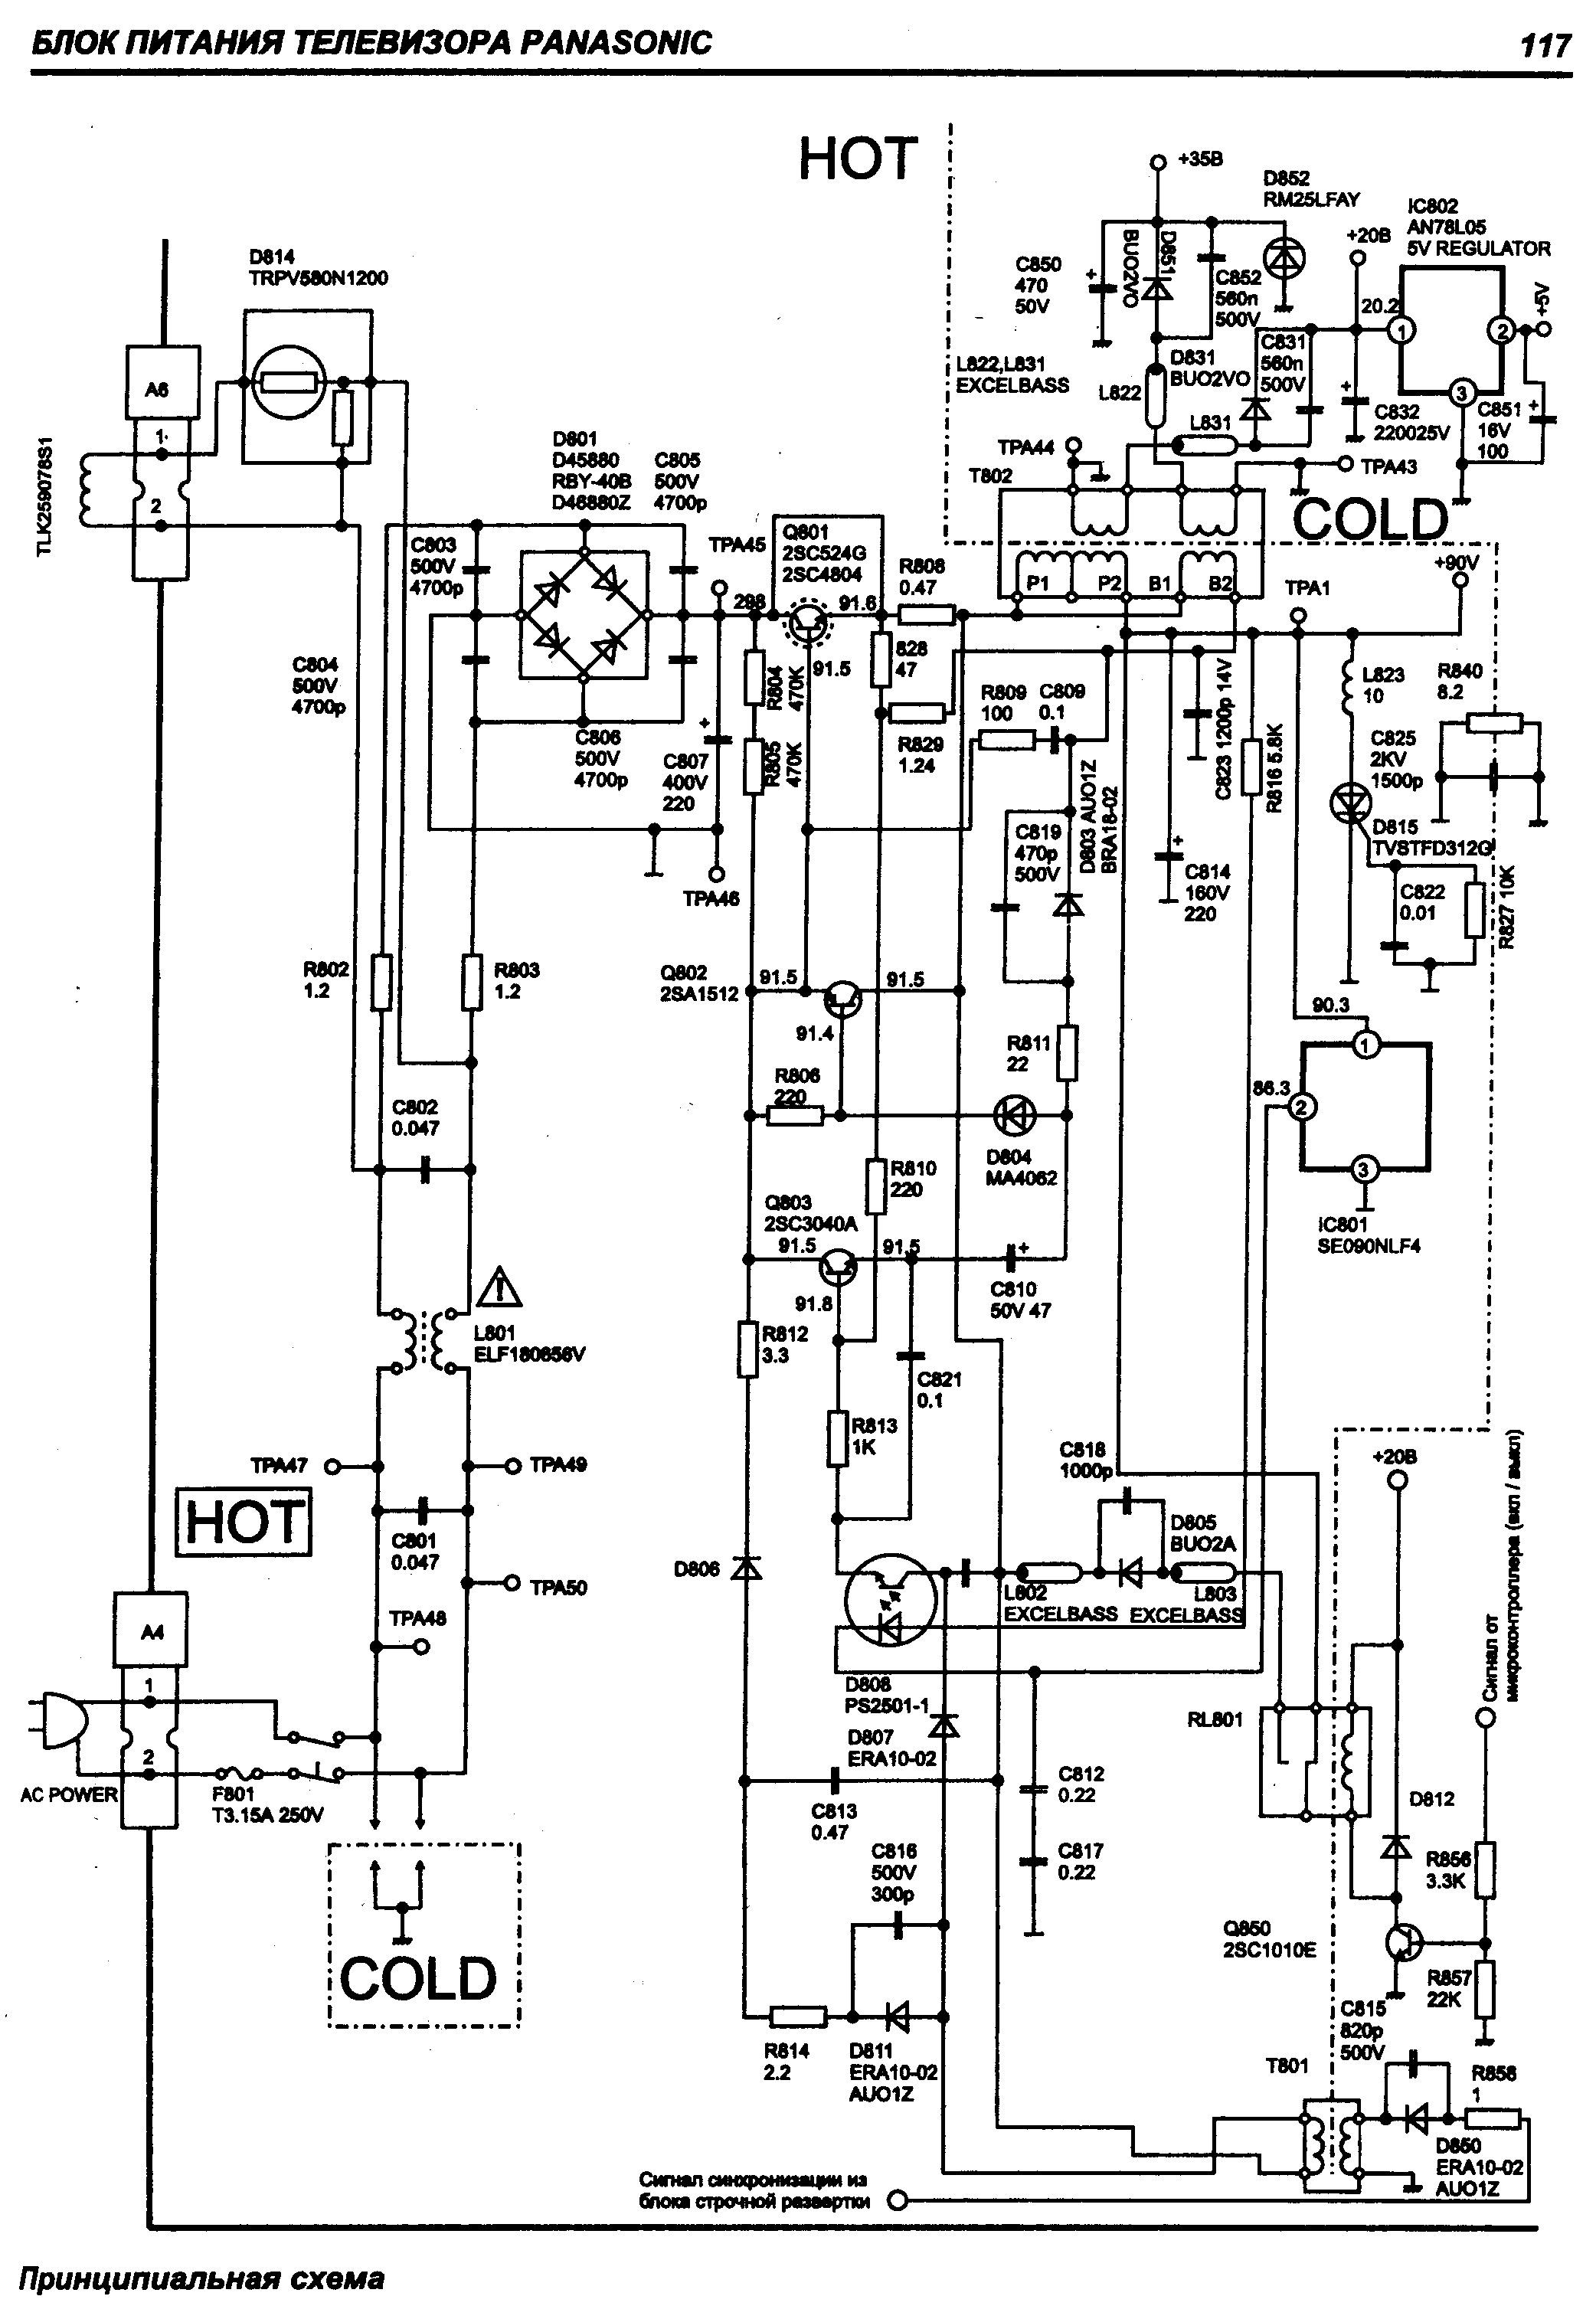 panasonic ct21 panason4 gif diagramas de televisores lcd y plasma